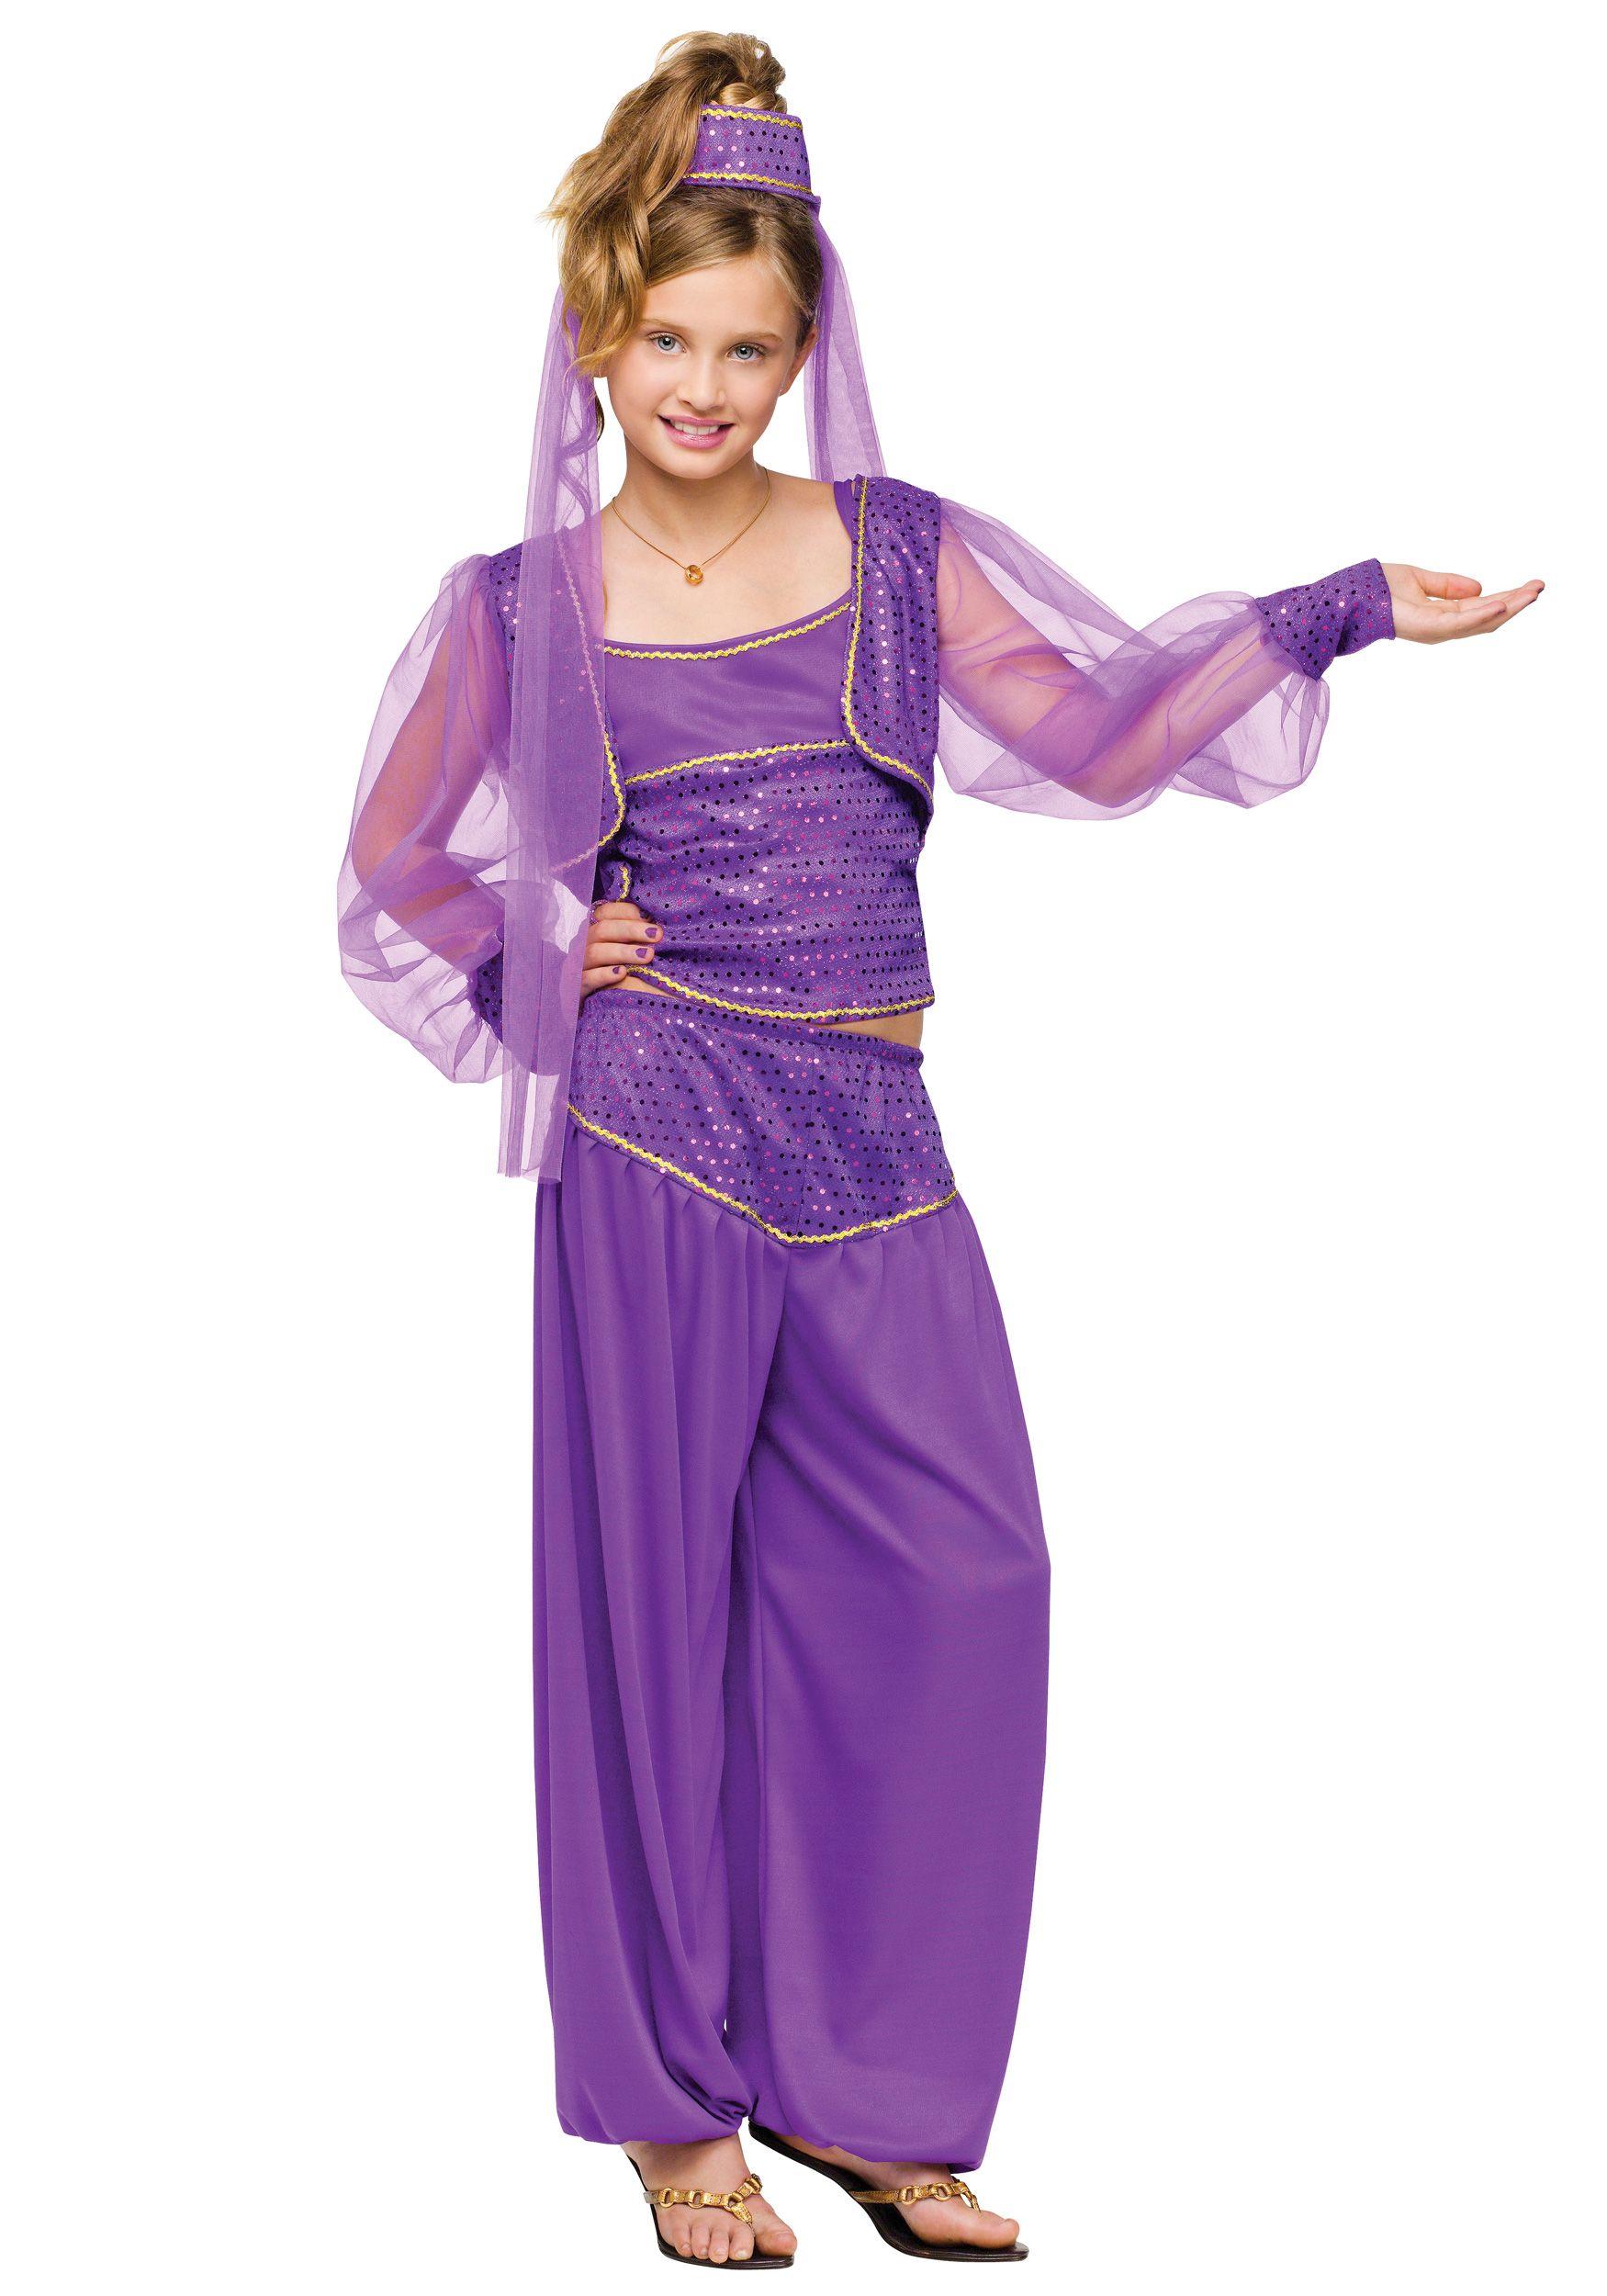 Child Dreamy Genie Costume | Genie costume, Costumes and Child